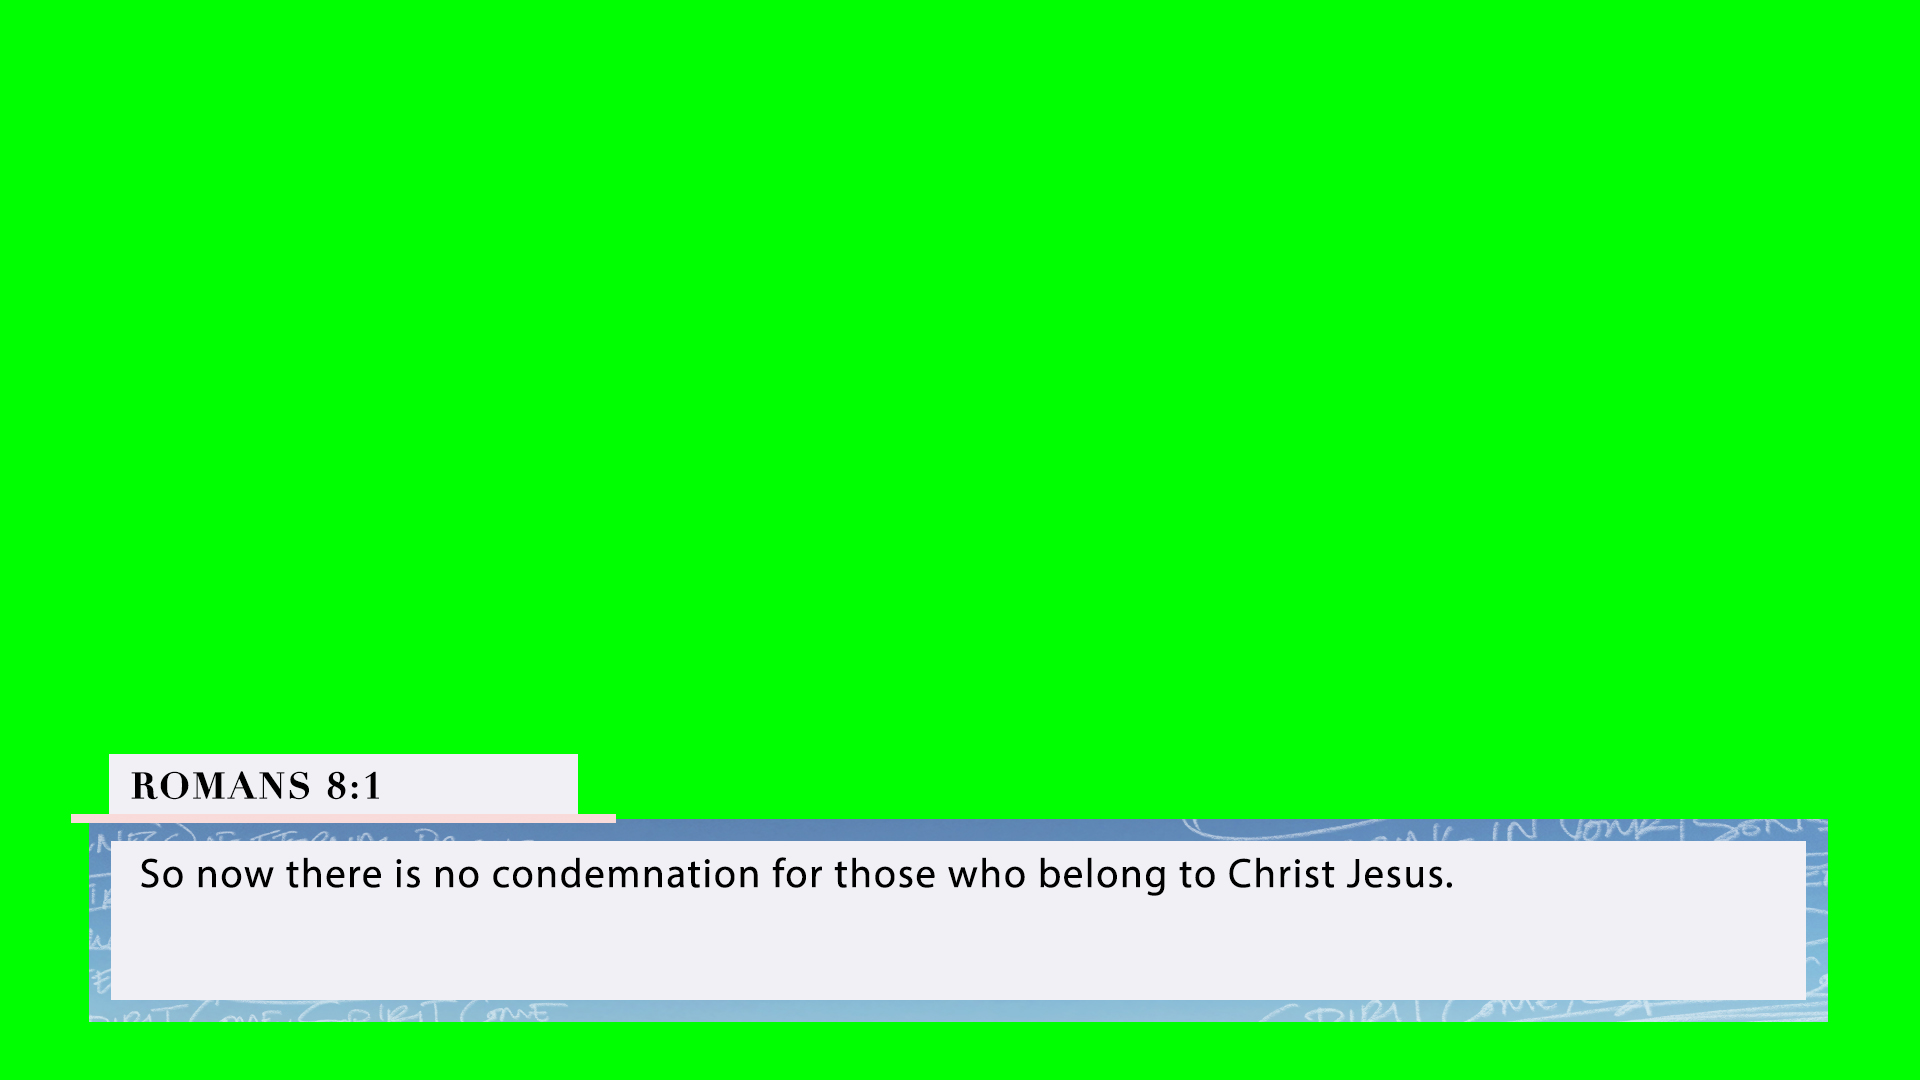 Romans 8:1 (JPG)